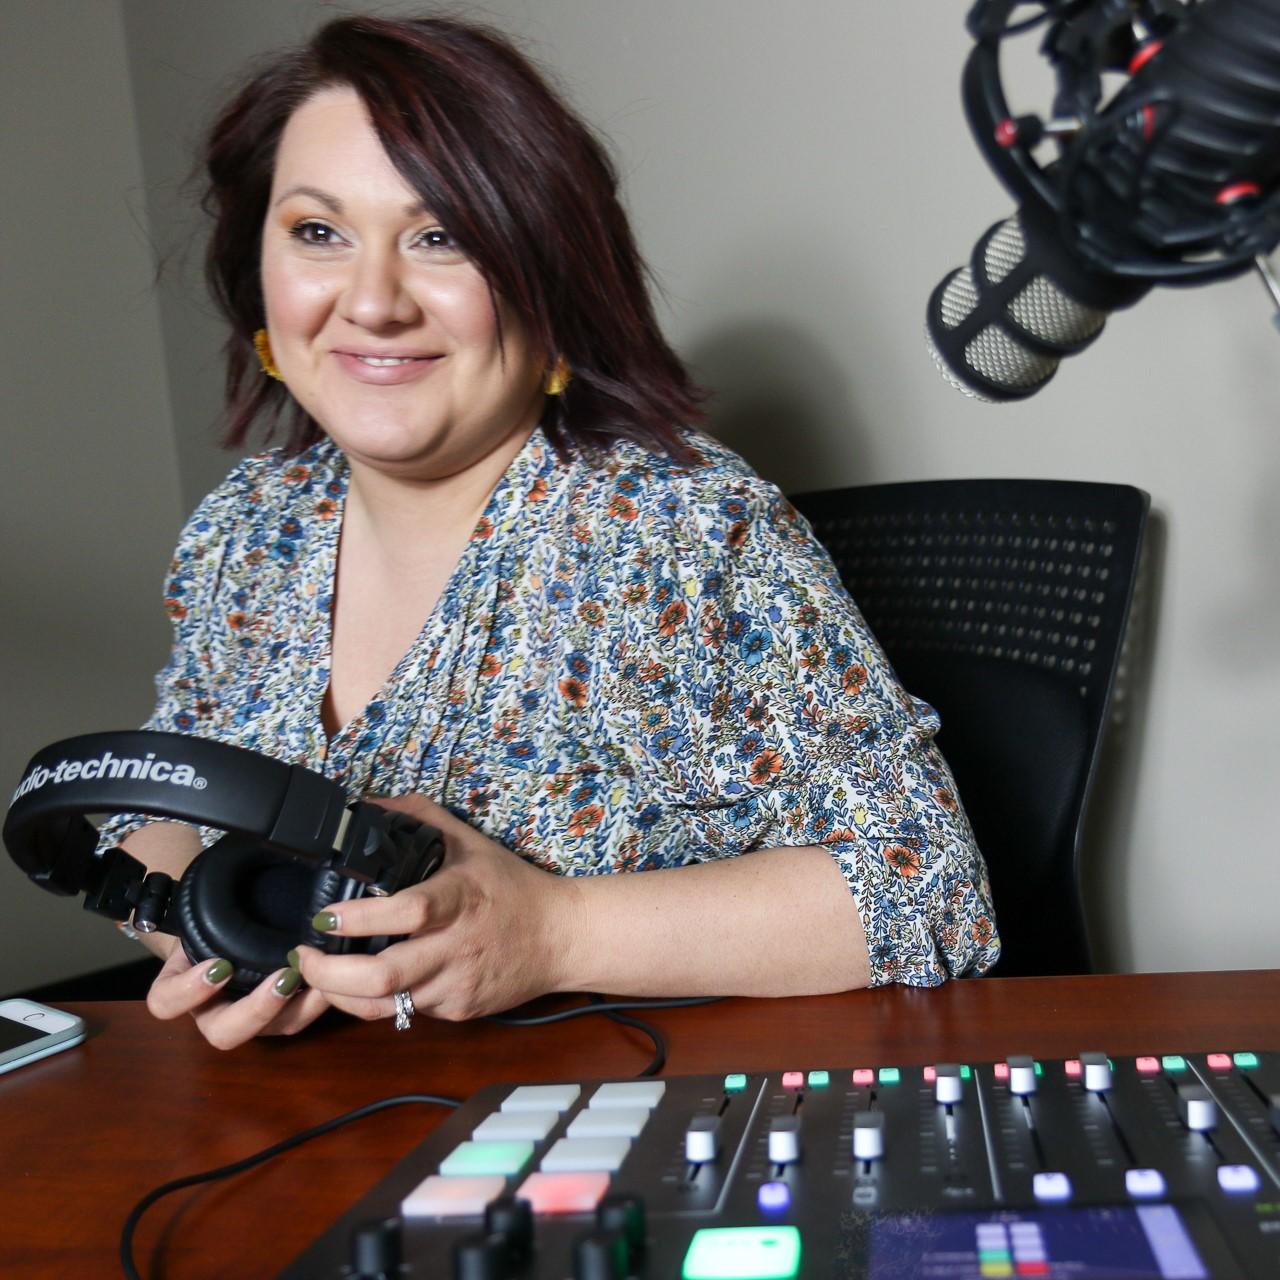 Photo: Colette Canchola Cox, host of Building Buchanan Podcast